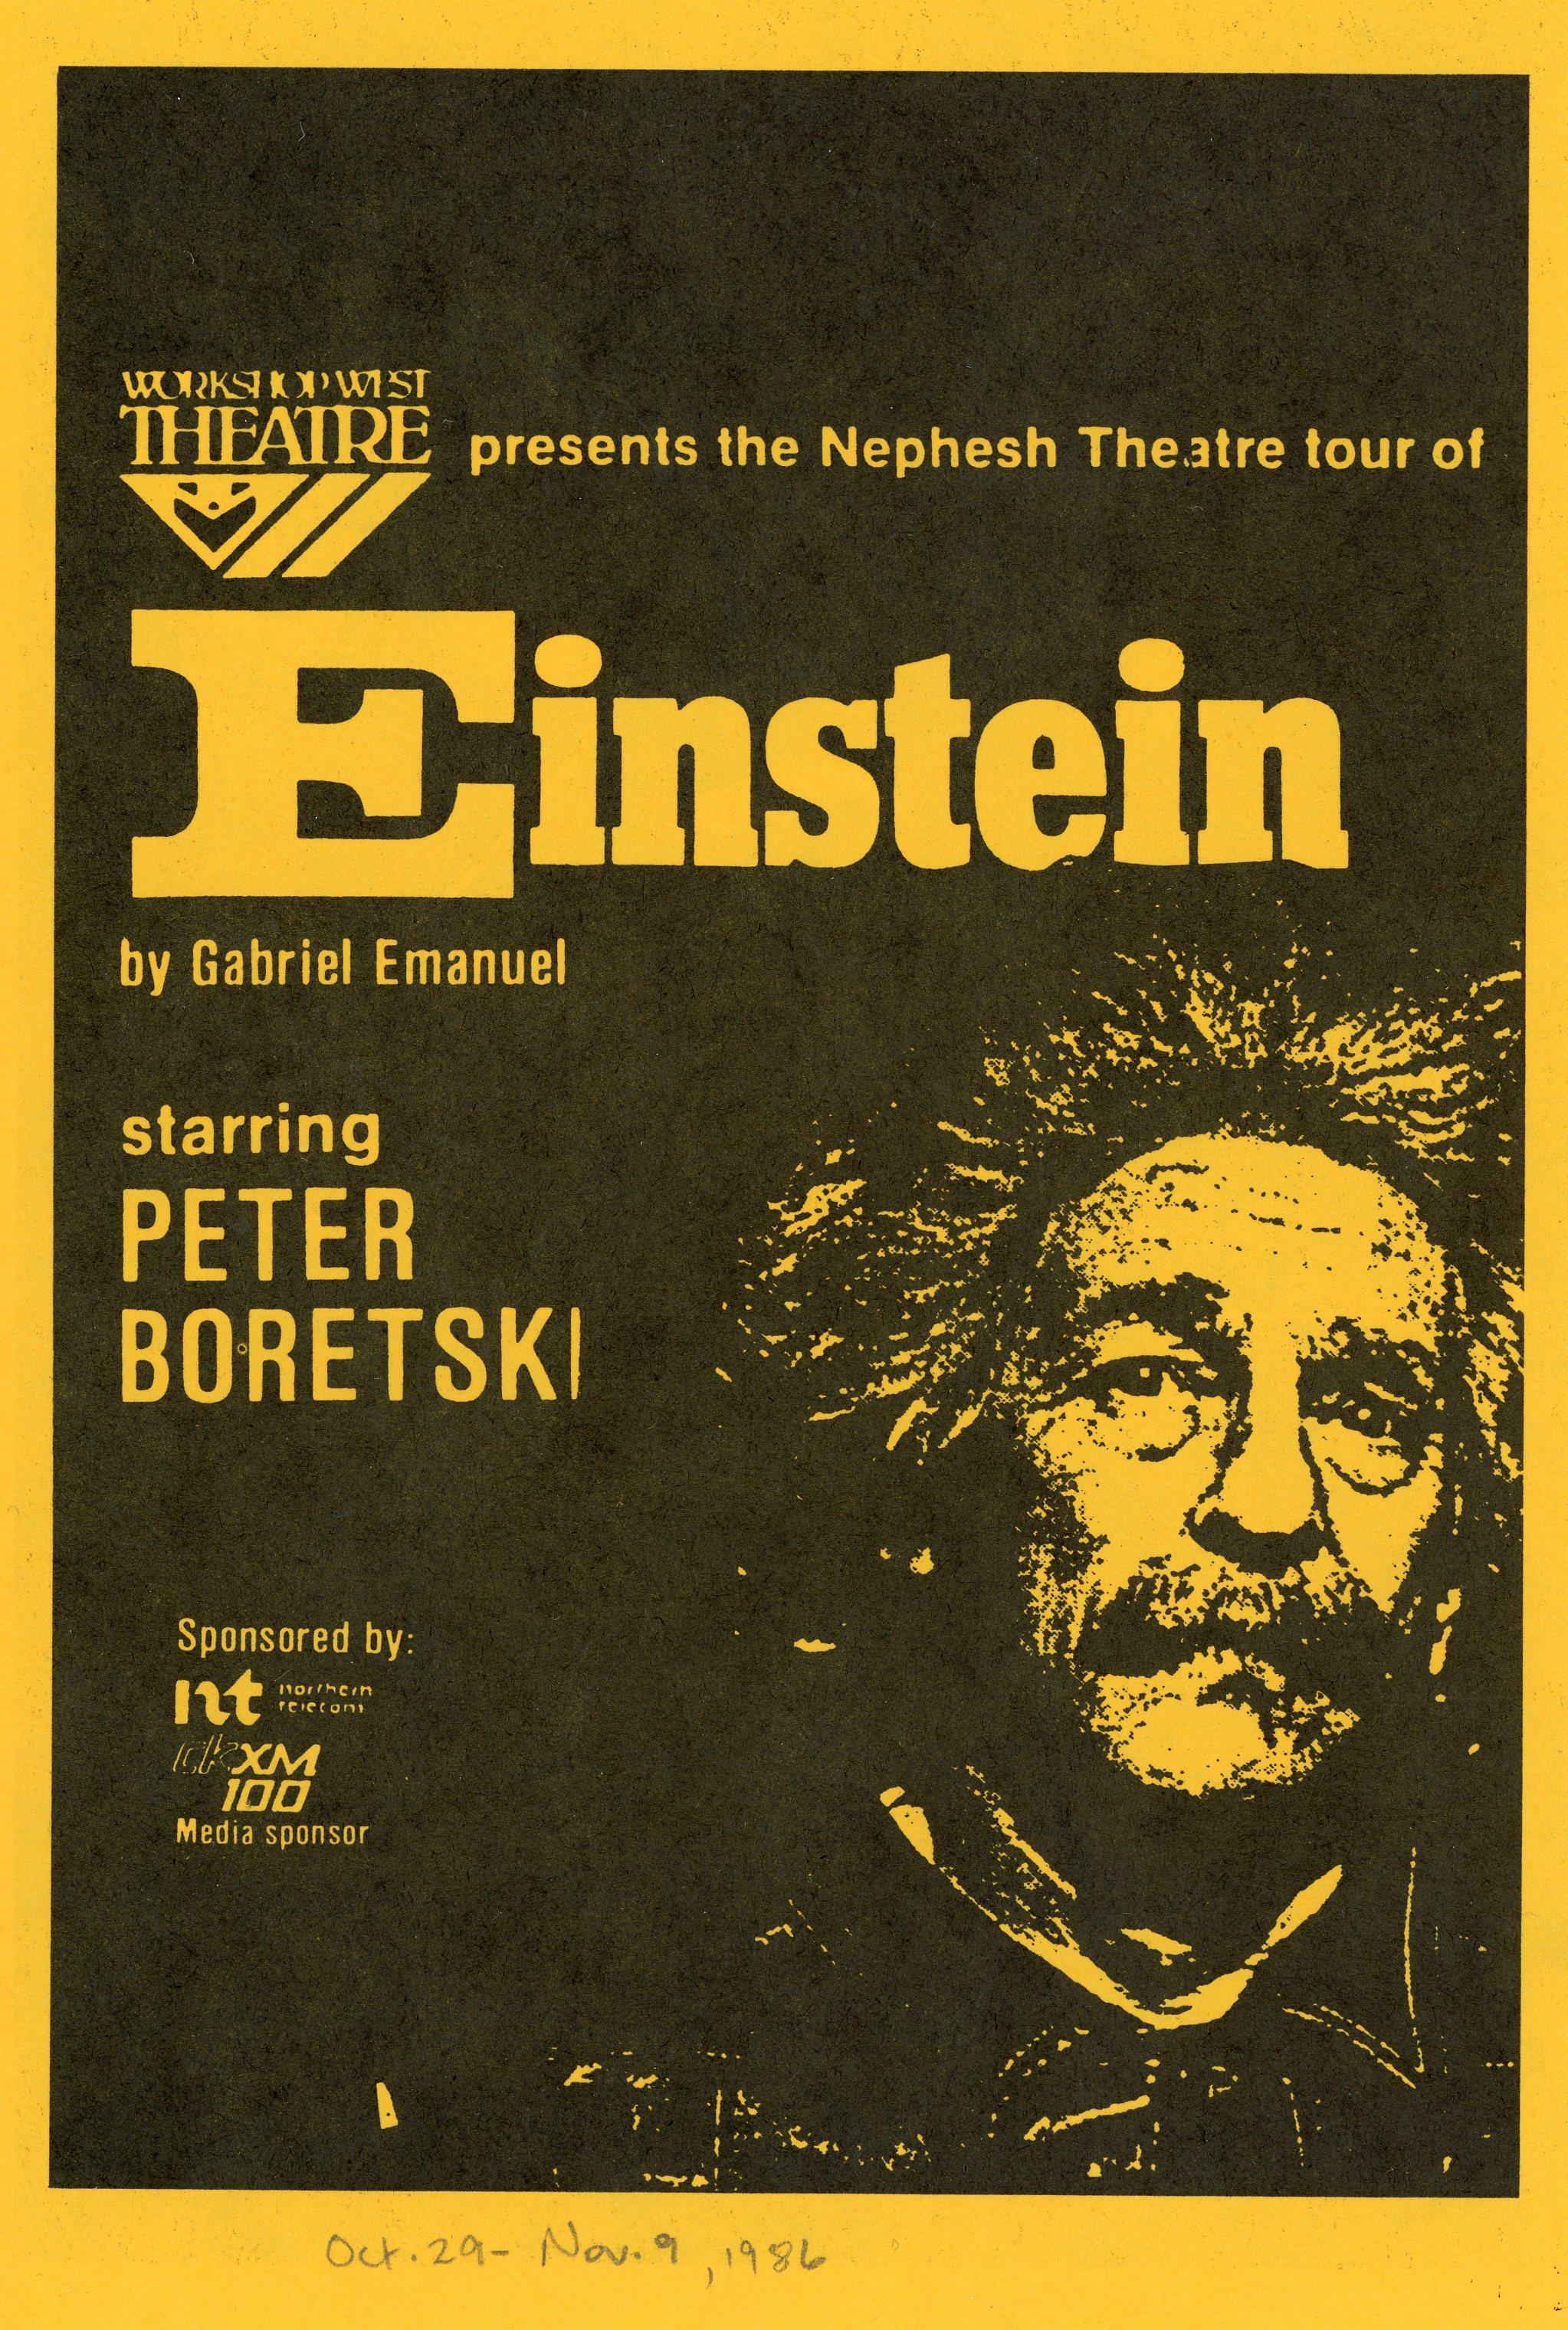 Einstein (On Tour) (October, 1986) - Program Cover.jpg